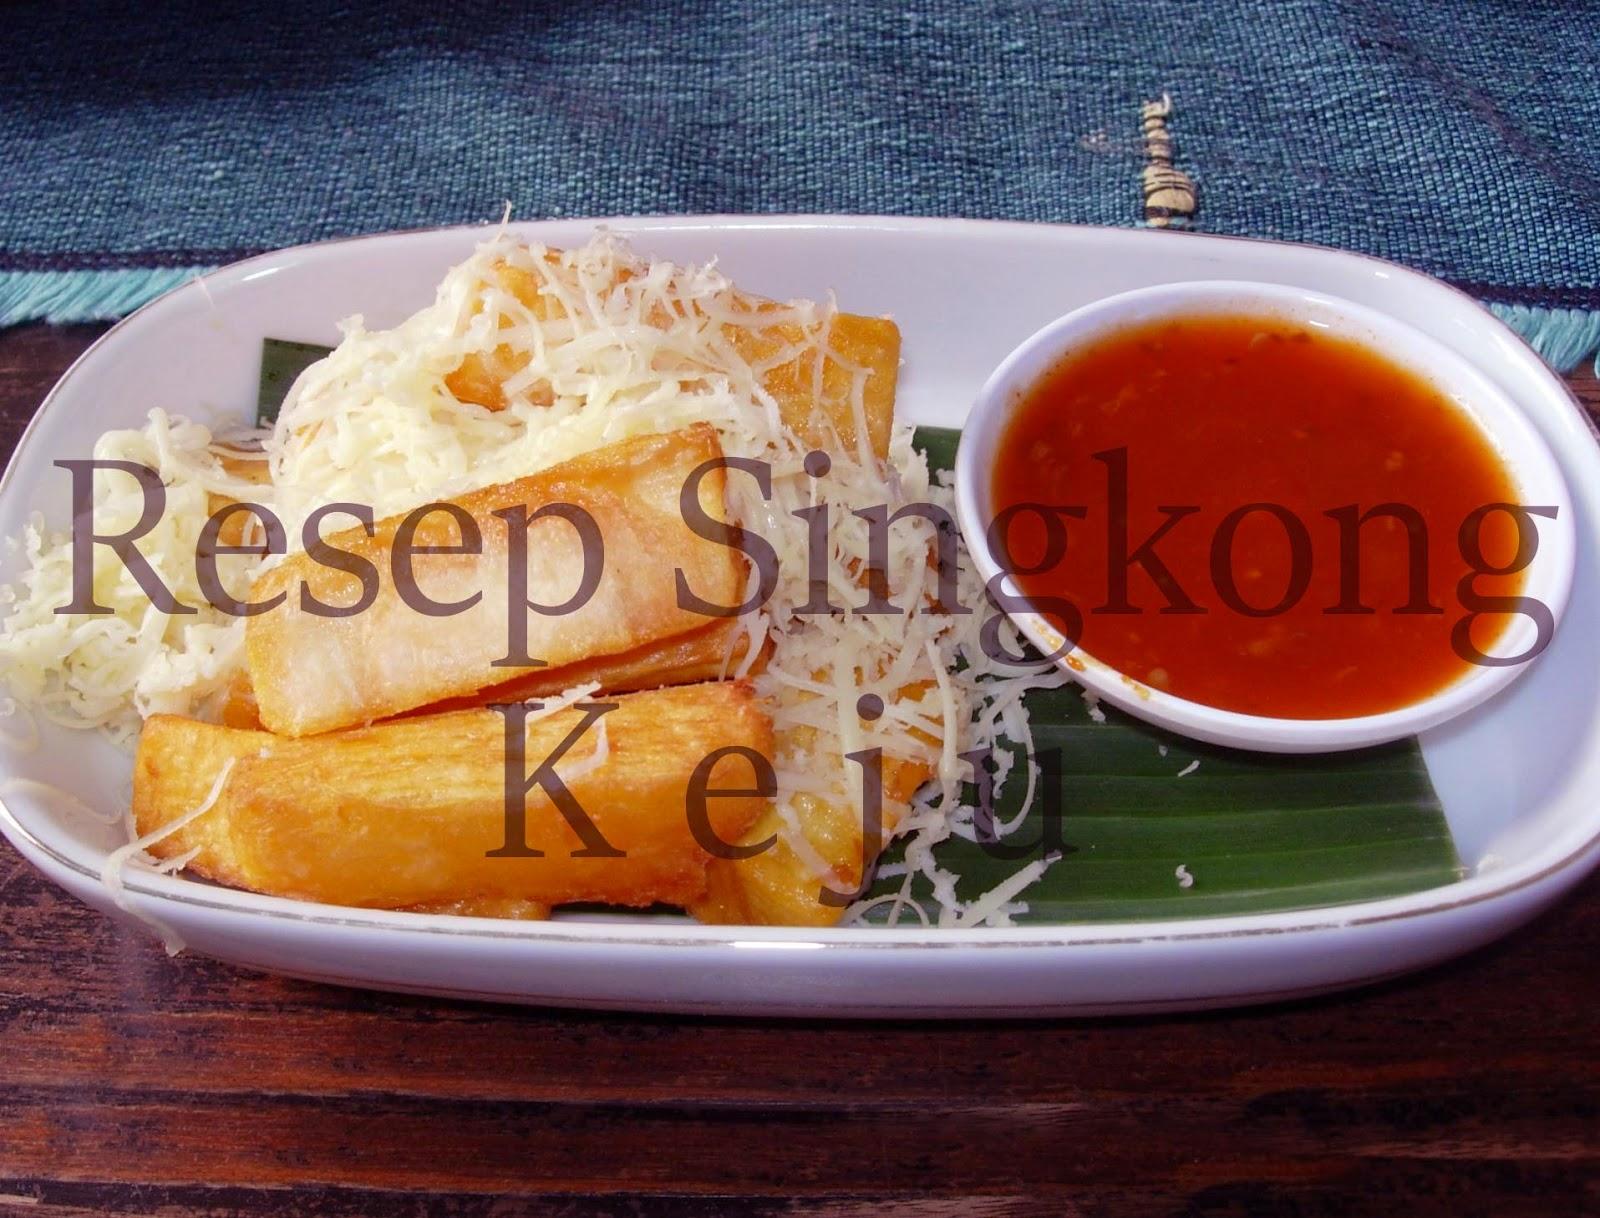 Resep Singkong Keju Goreng | Resep Kue dari Singkong